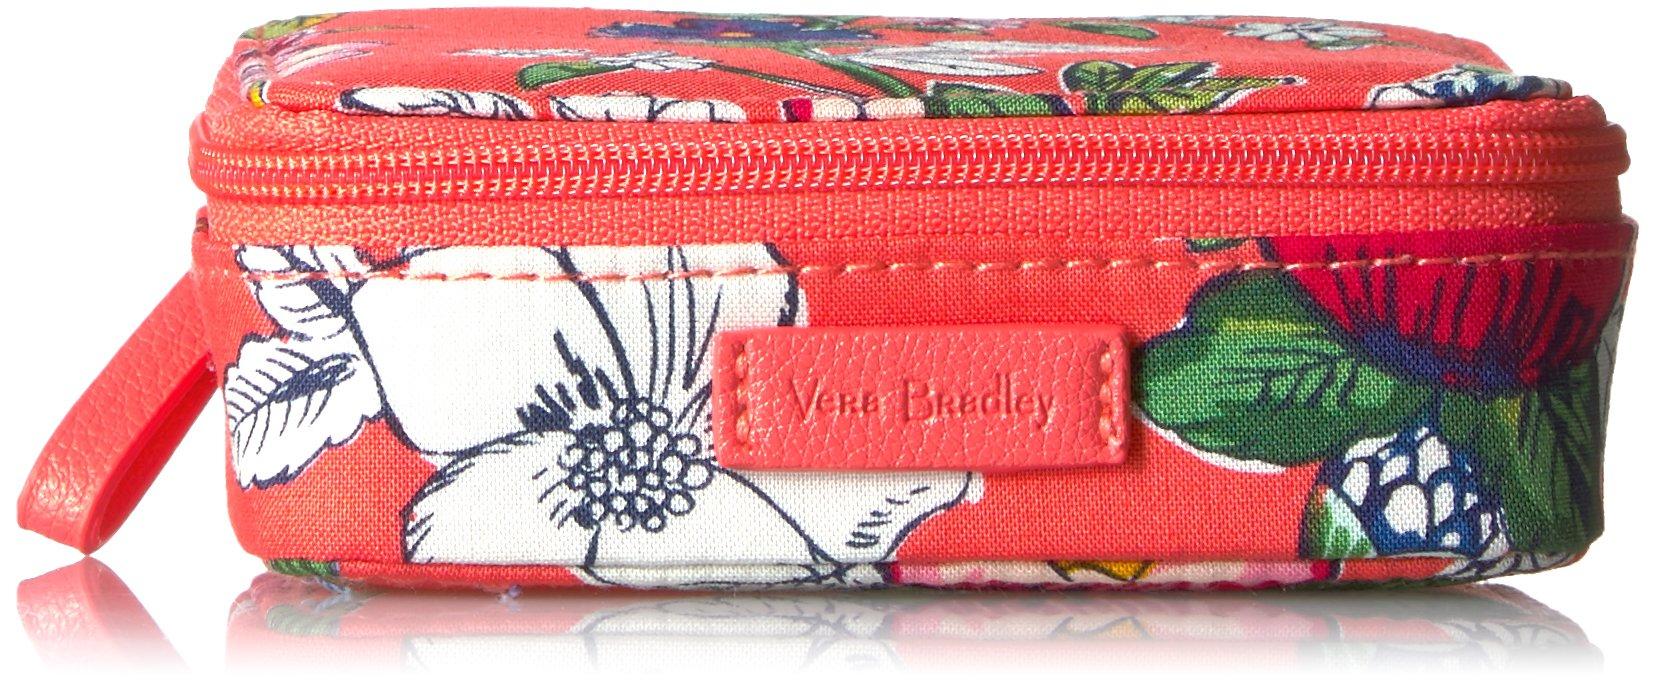 Vera Bradley Women's Iconic Travel Pill Case - Signature, Coral Floral